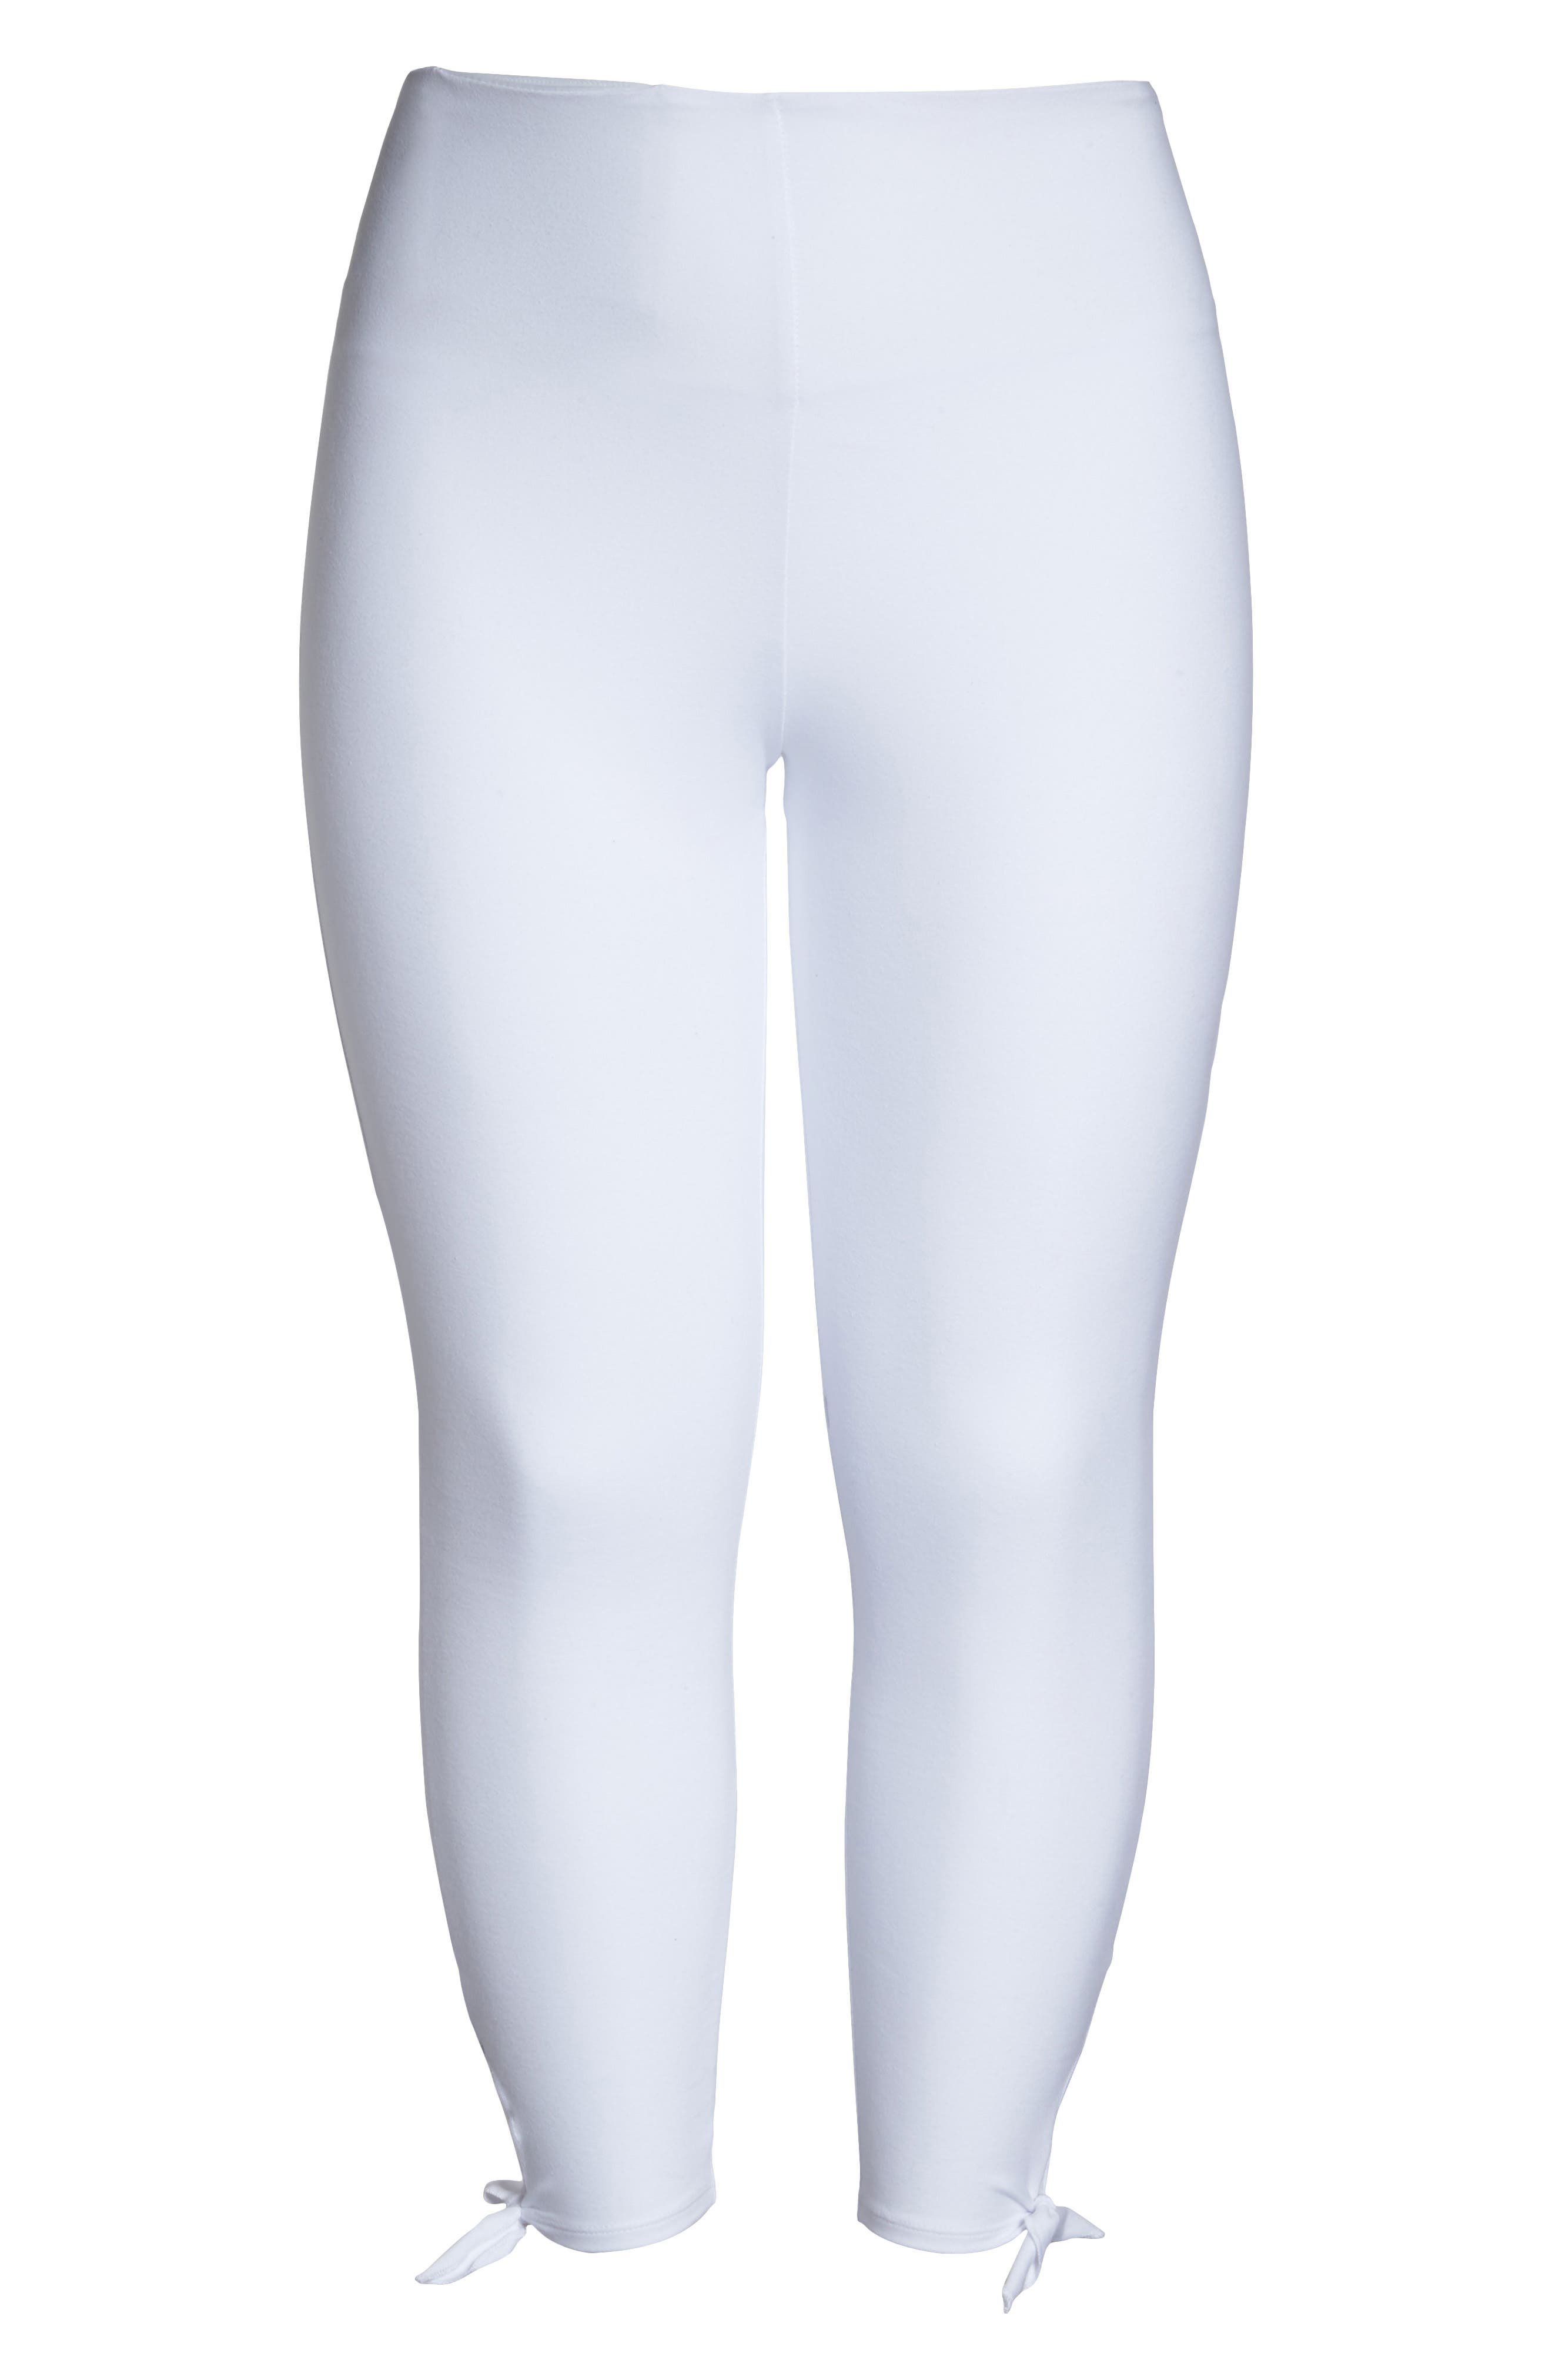 Tie Crop Leggings,                             Alternate thumbnail 4, color,                             White